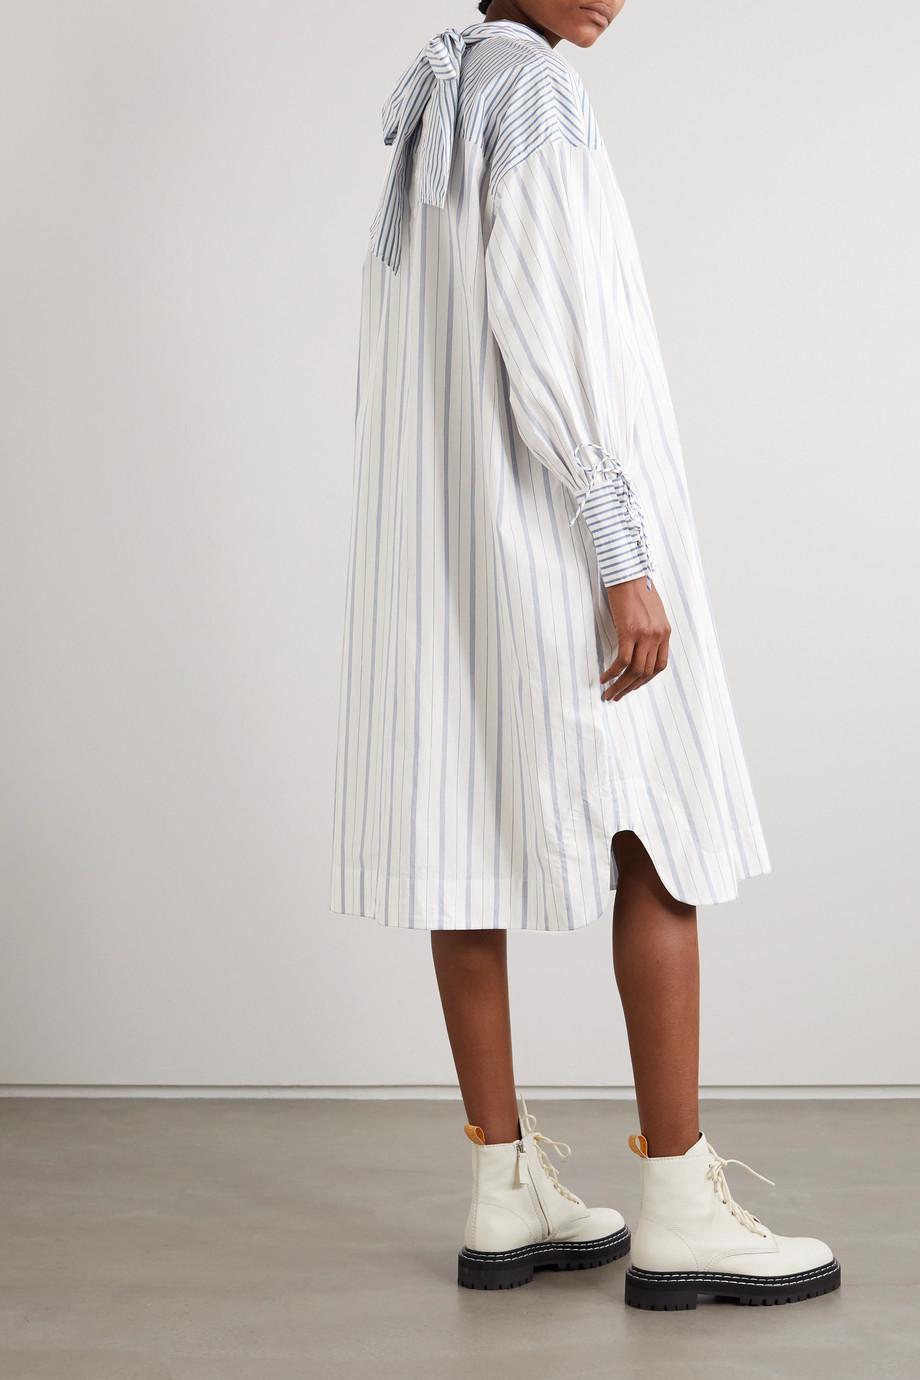 GANNI + NET SUSTAIN tie-detailed striped organic cotton-poplin dress